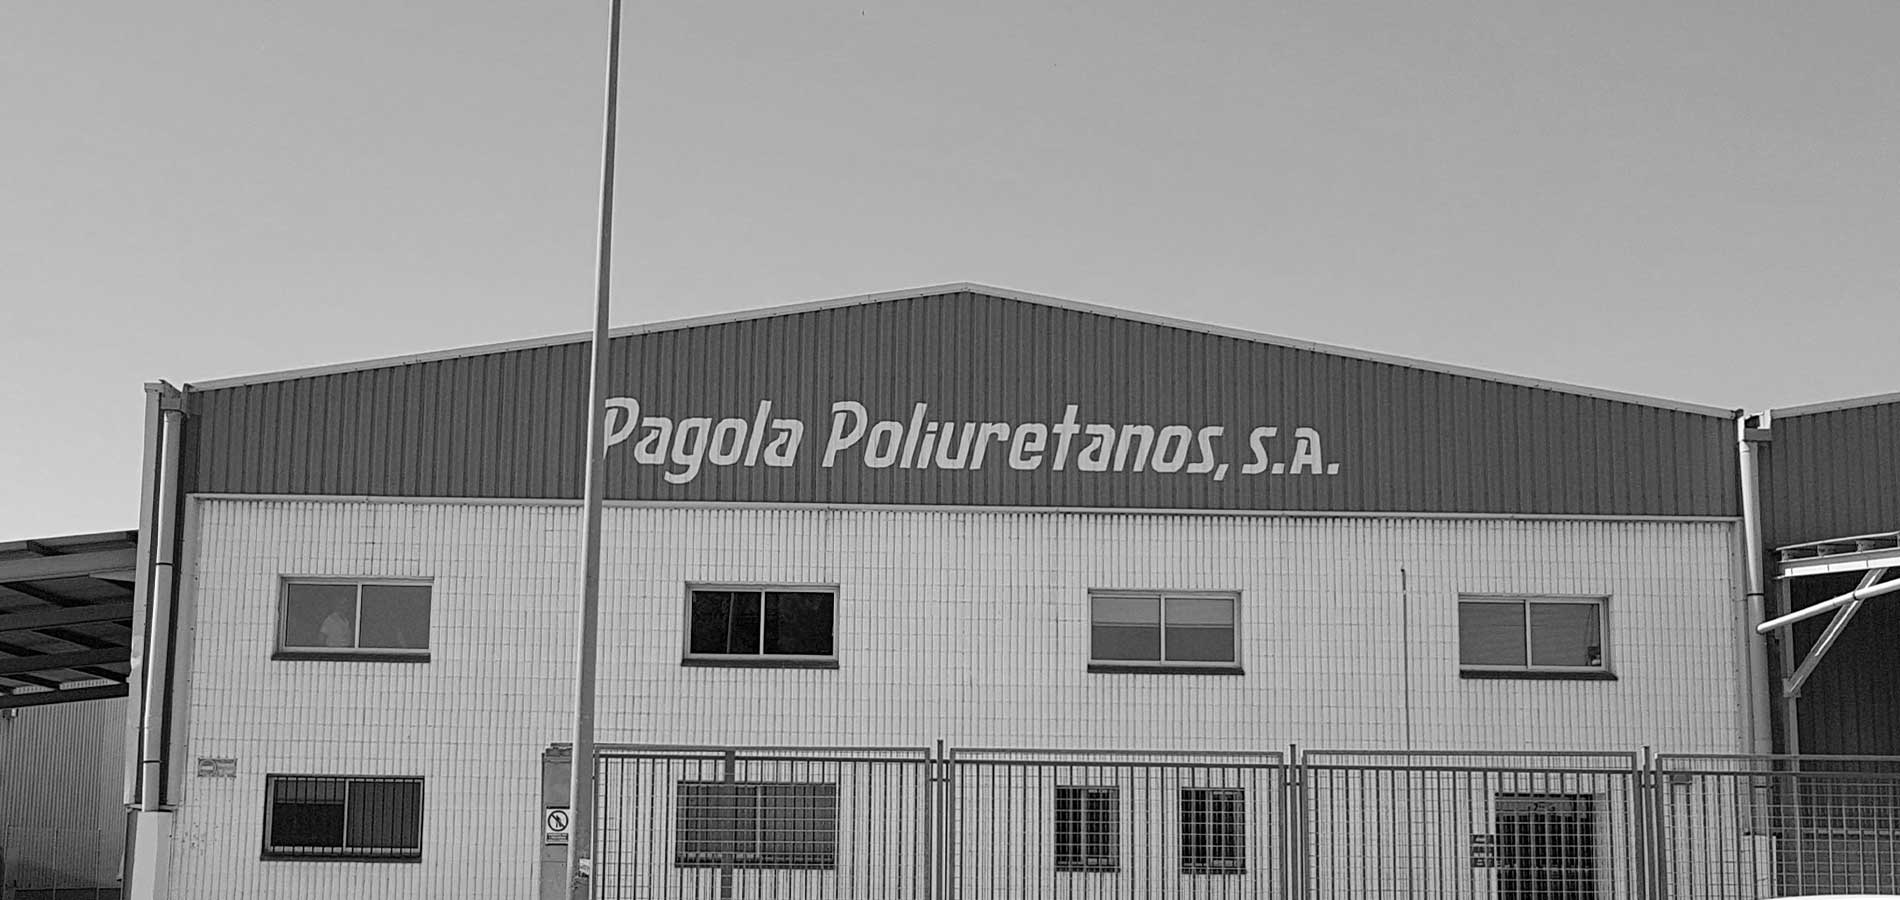 Pagola Poliuretanos, inicios